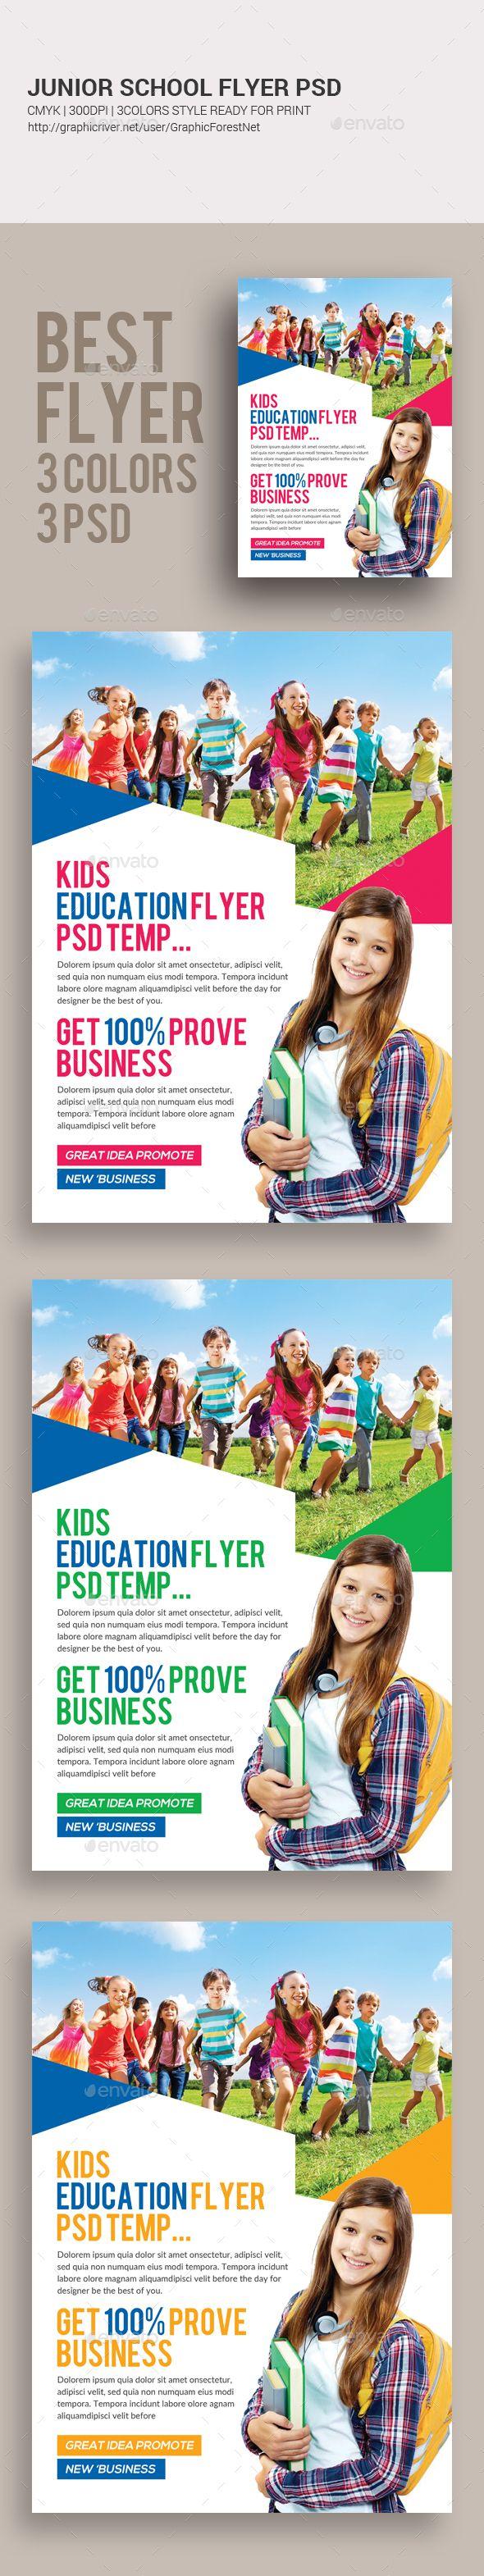 Junior School Education Flyer  — PSD Template #flyer #poster • Download ➝ https://graphicriver.net/item/junior-school-education-flyer/18390245?ref=pxcr